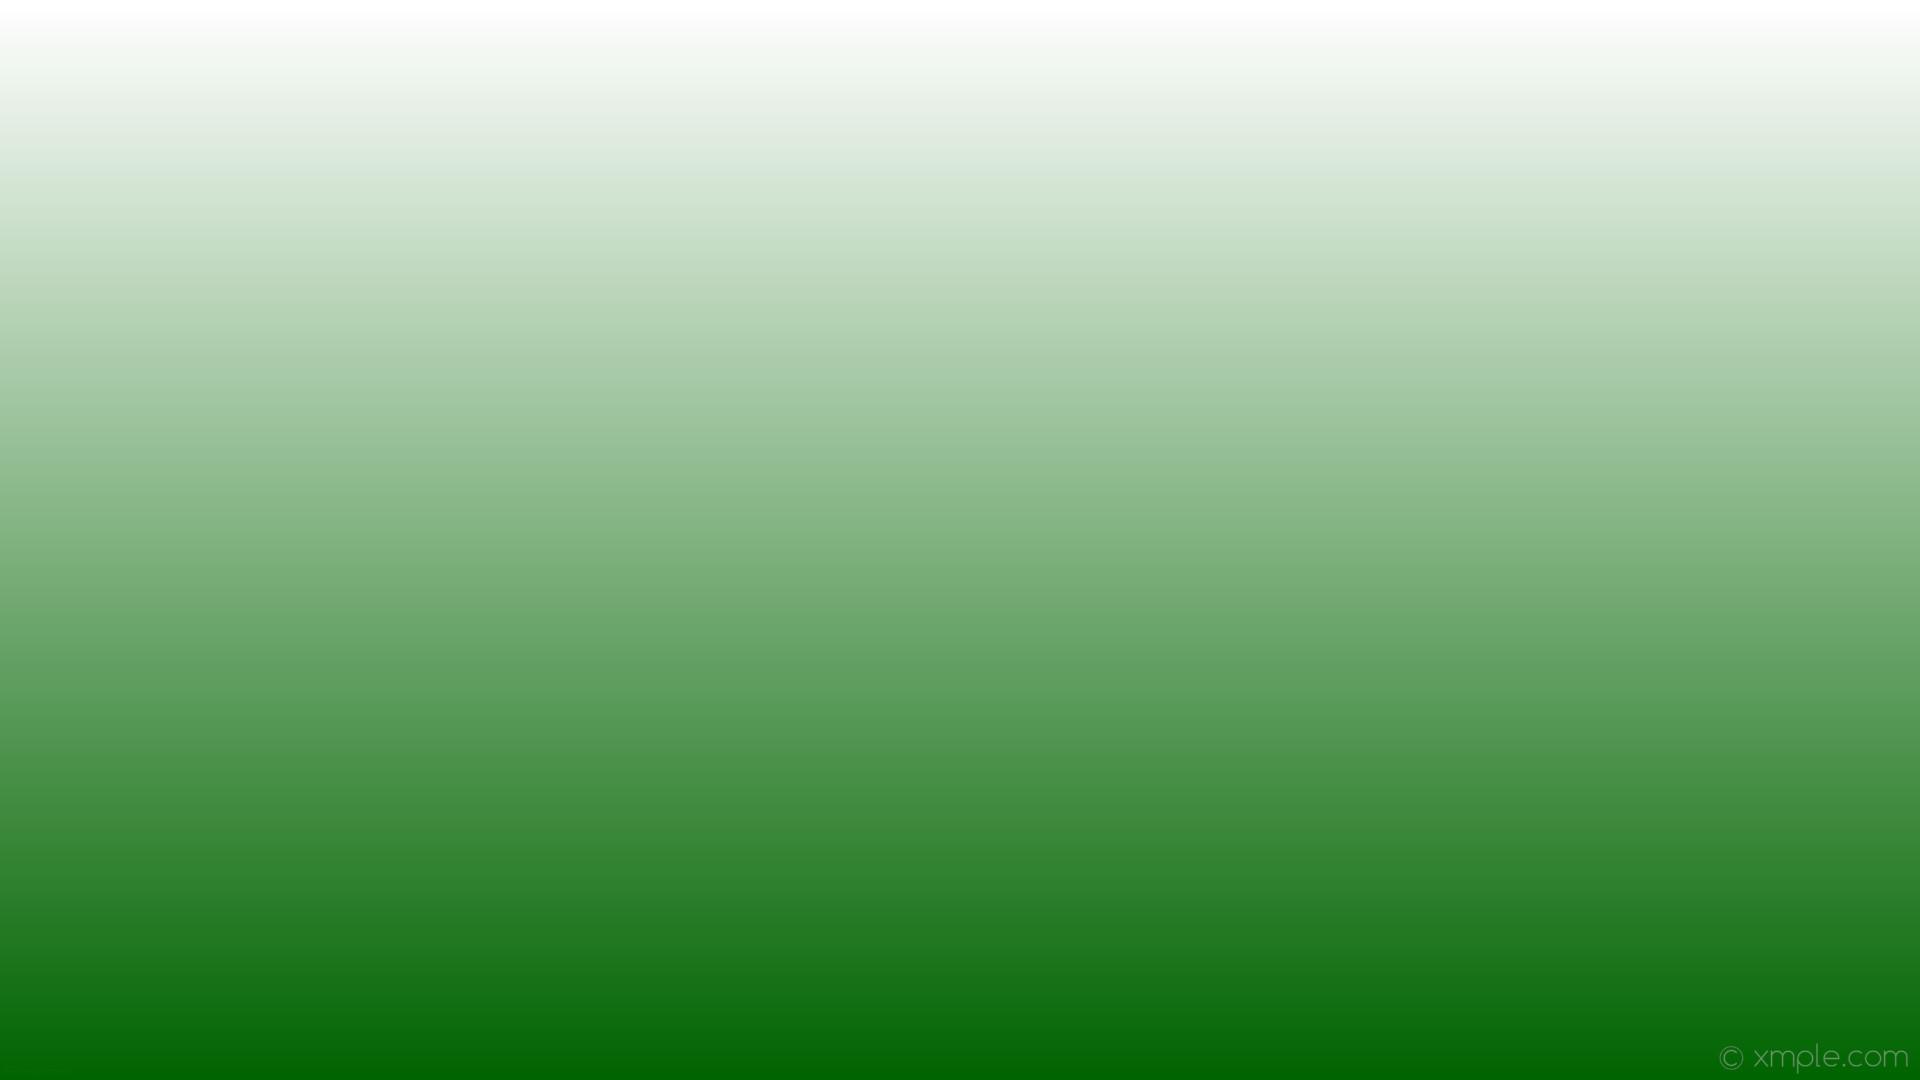 wallpaper gradient green white linear dark green #ffffff #006400 90°